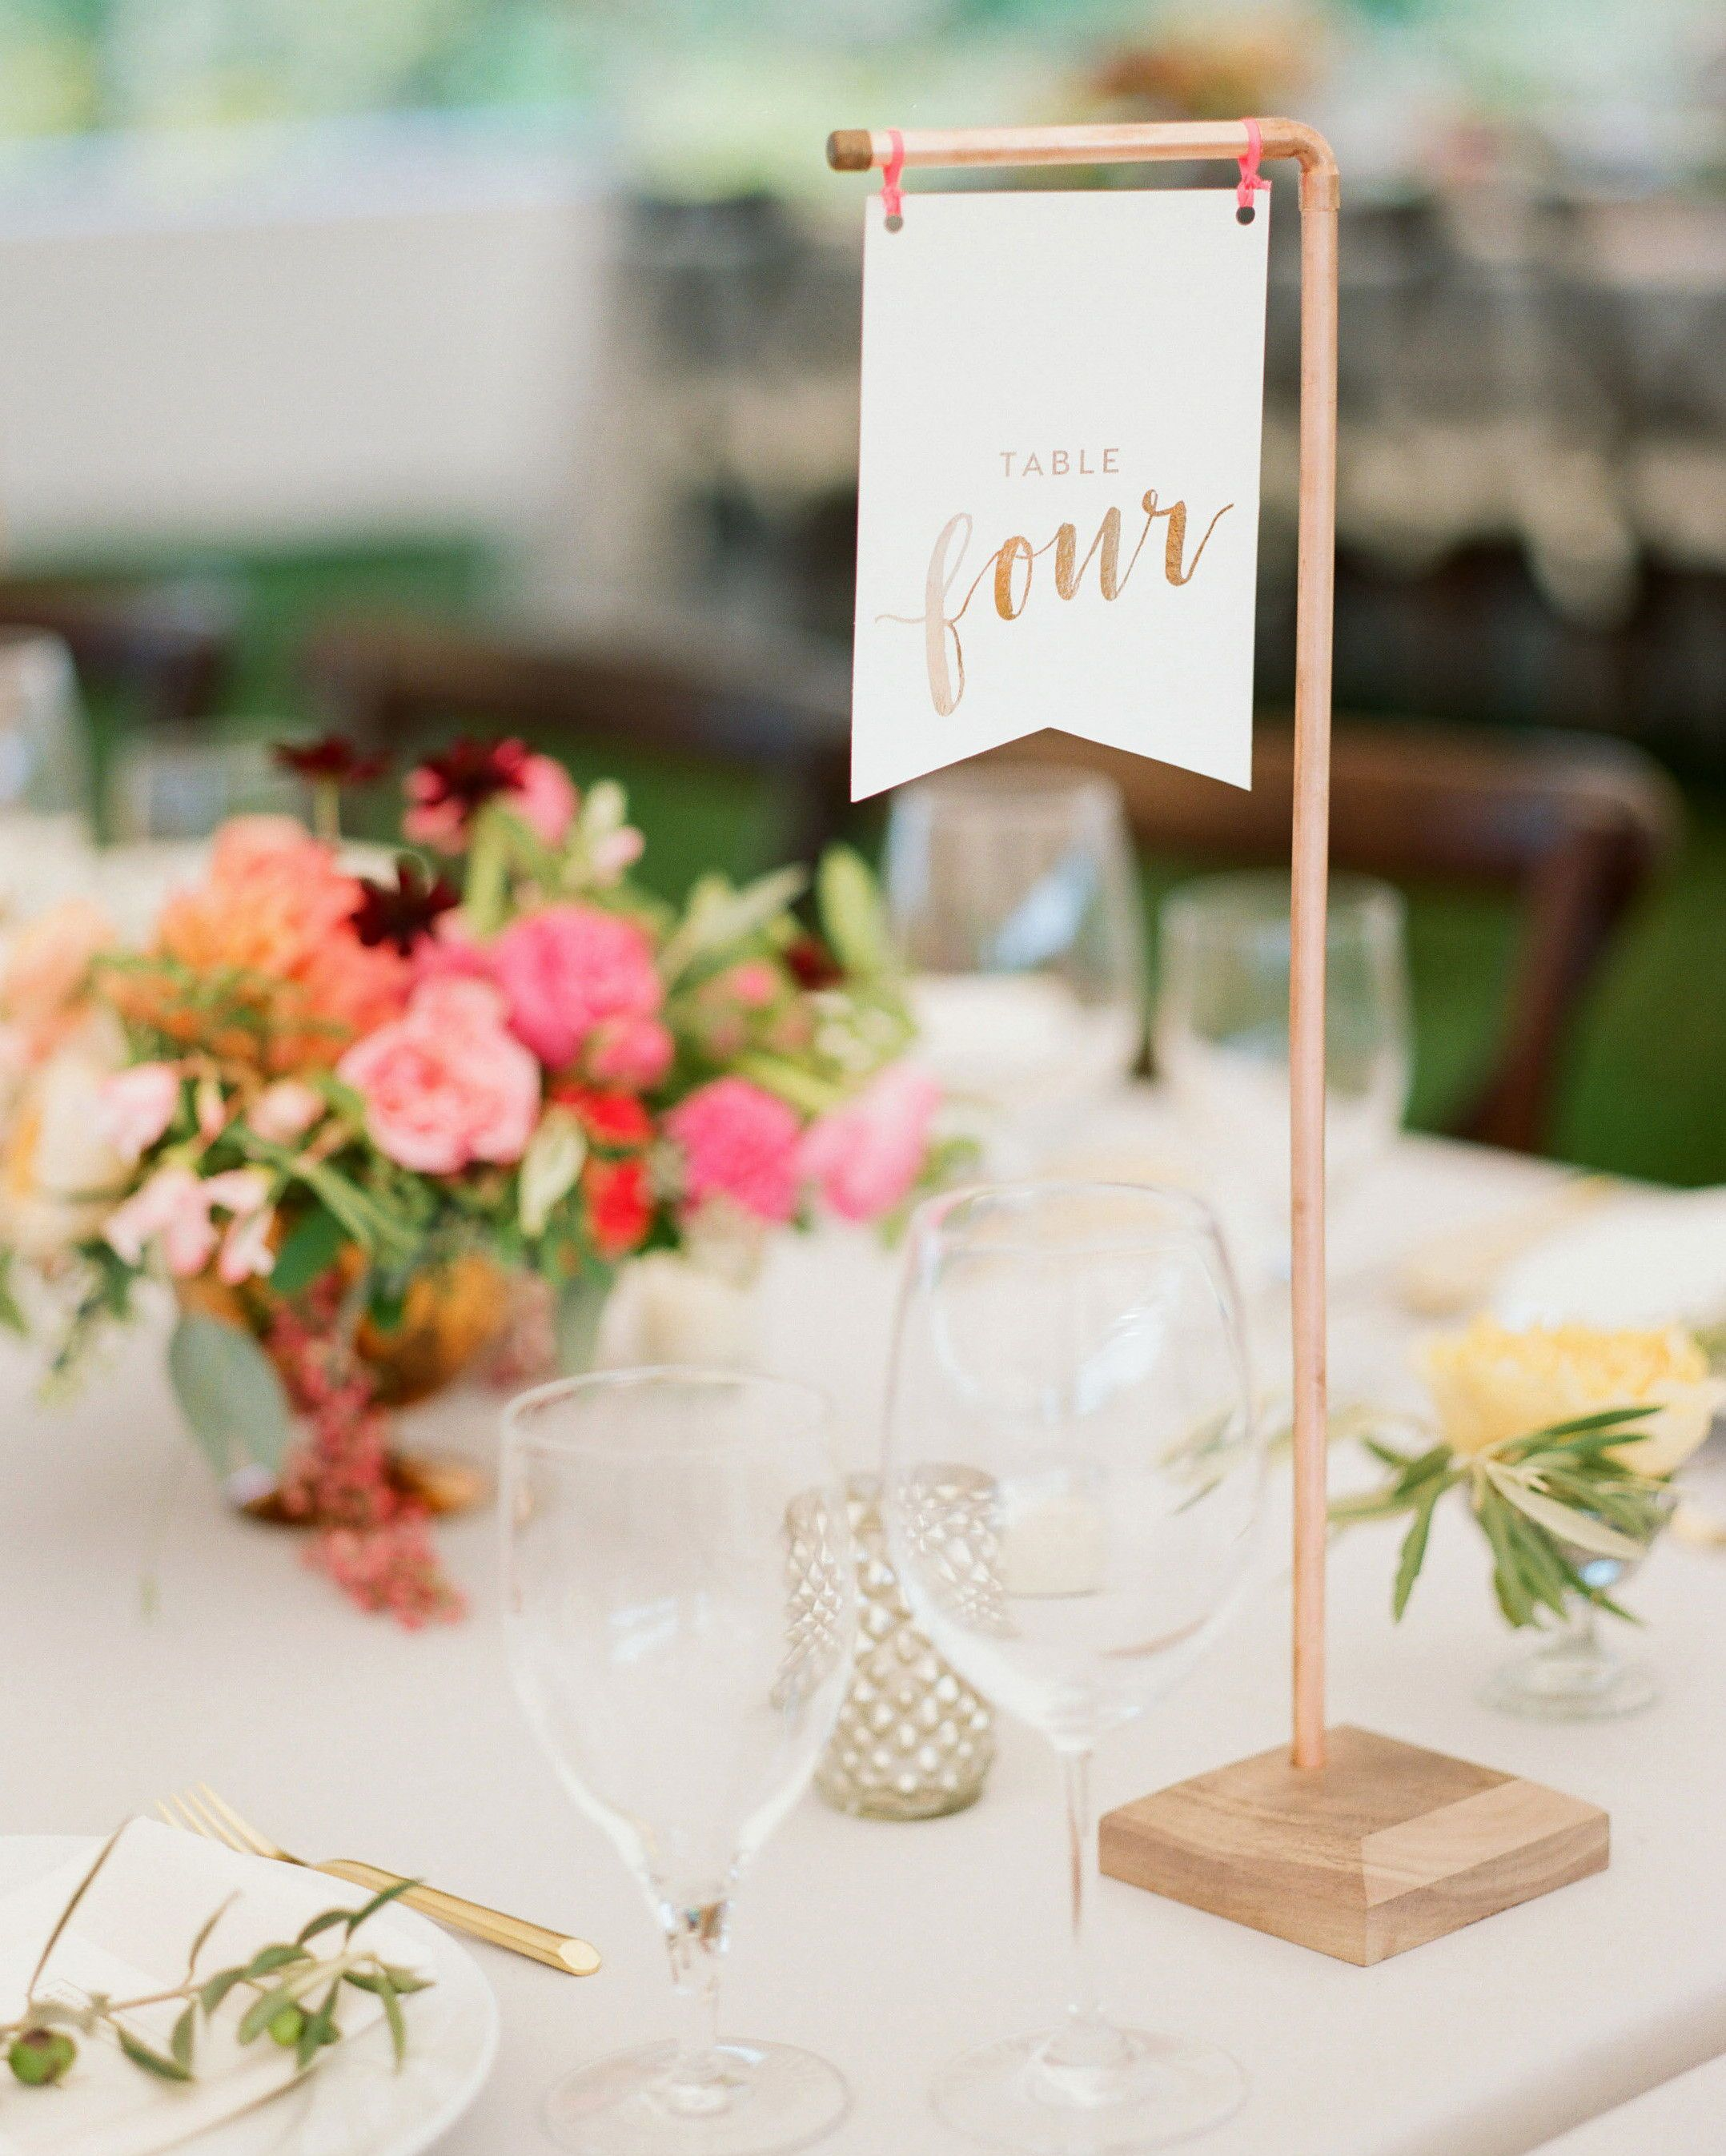 Rose Gold Wedding Ideas That Make A Statement Wedding Table